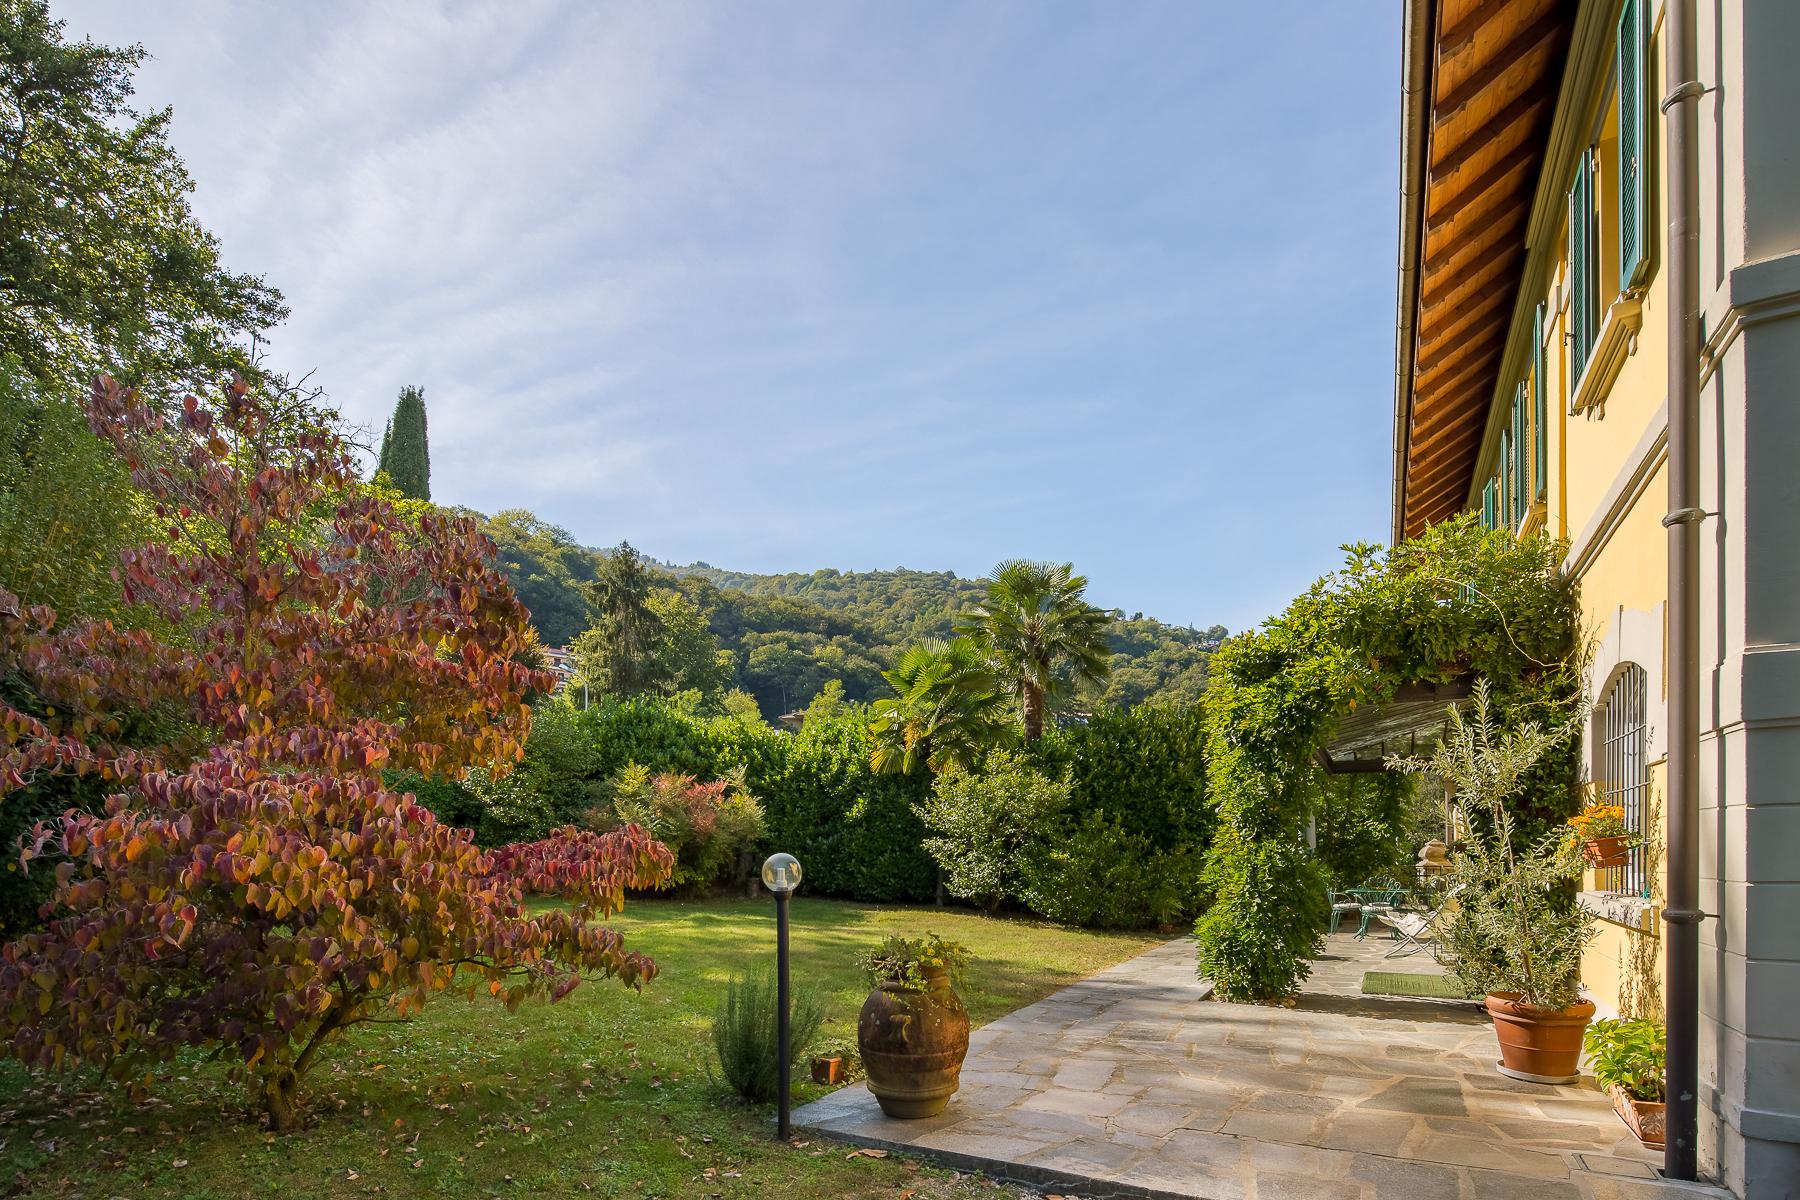 Villa in Vendita a Stresa: 5 locali, 240 mq